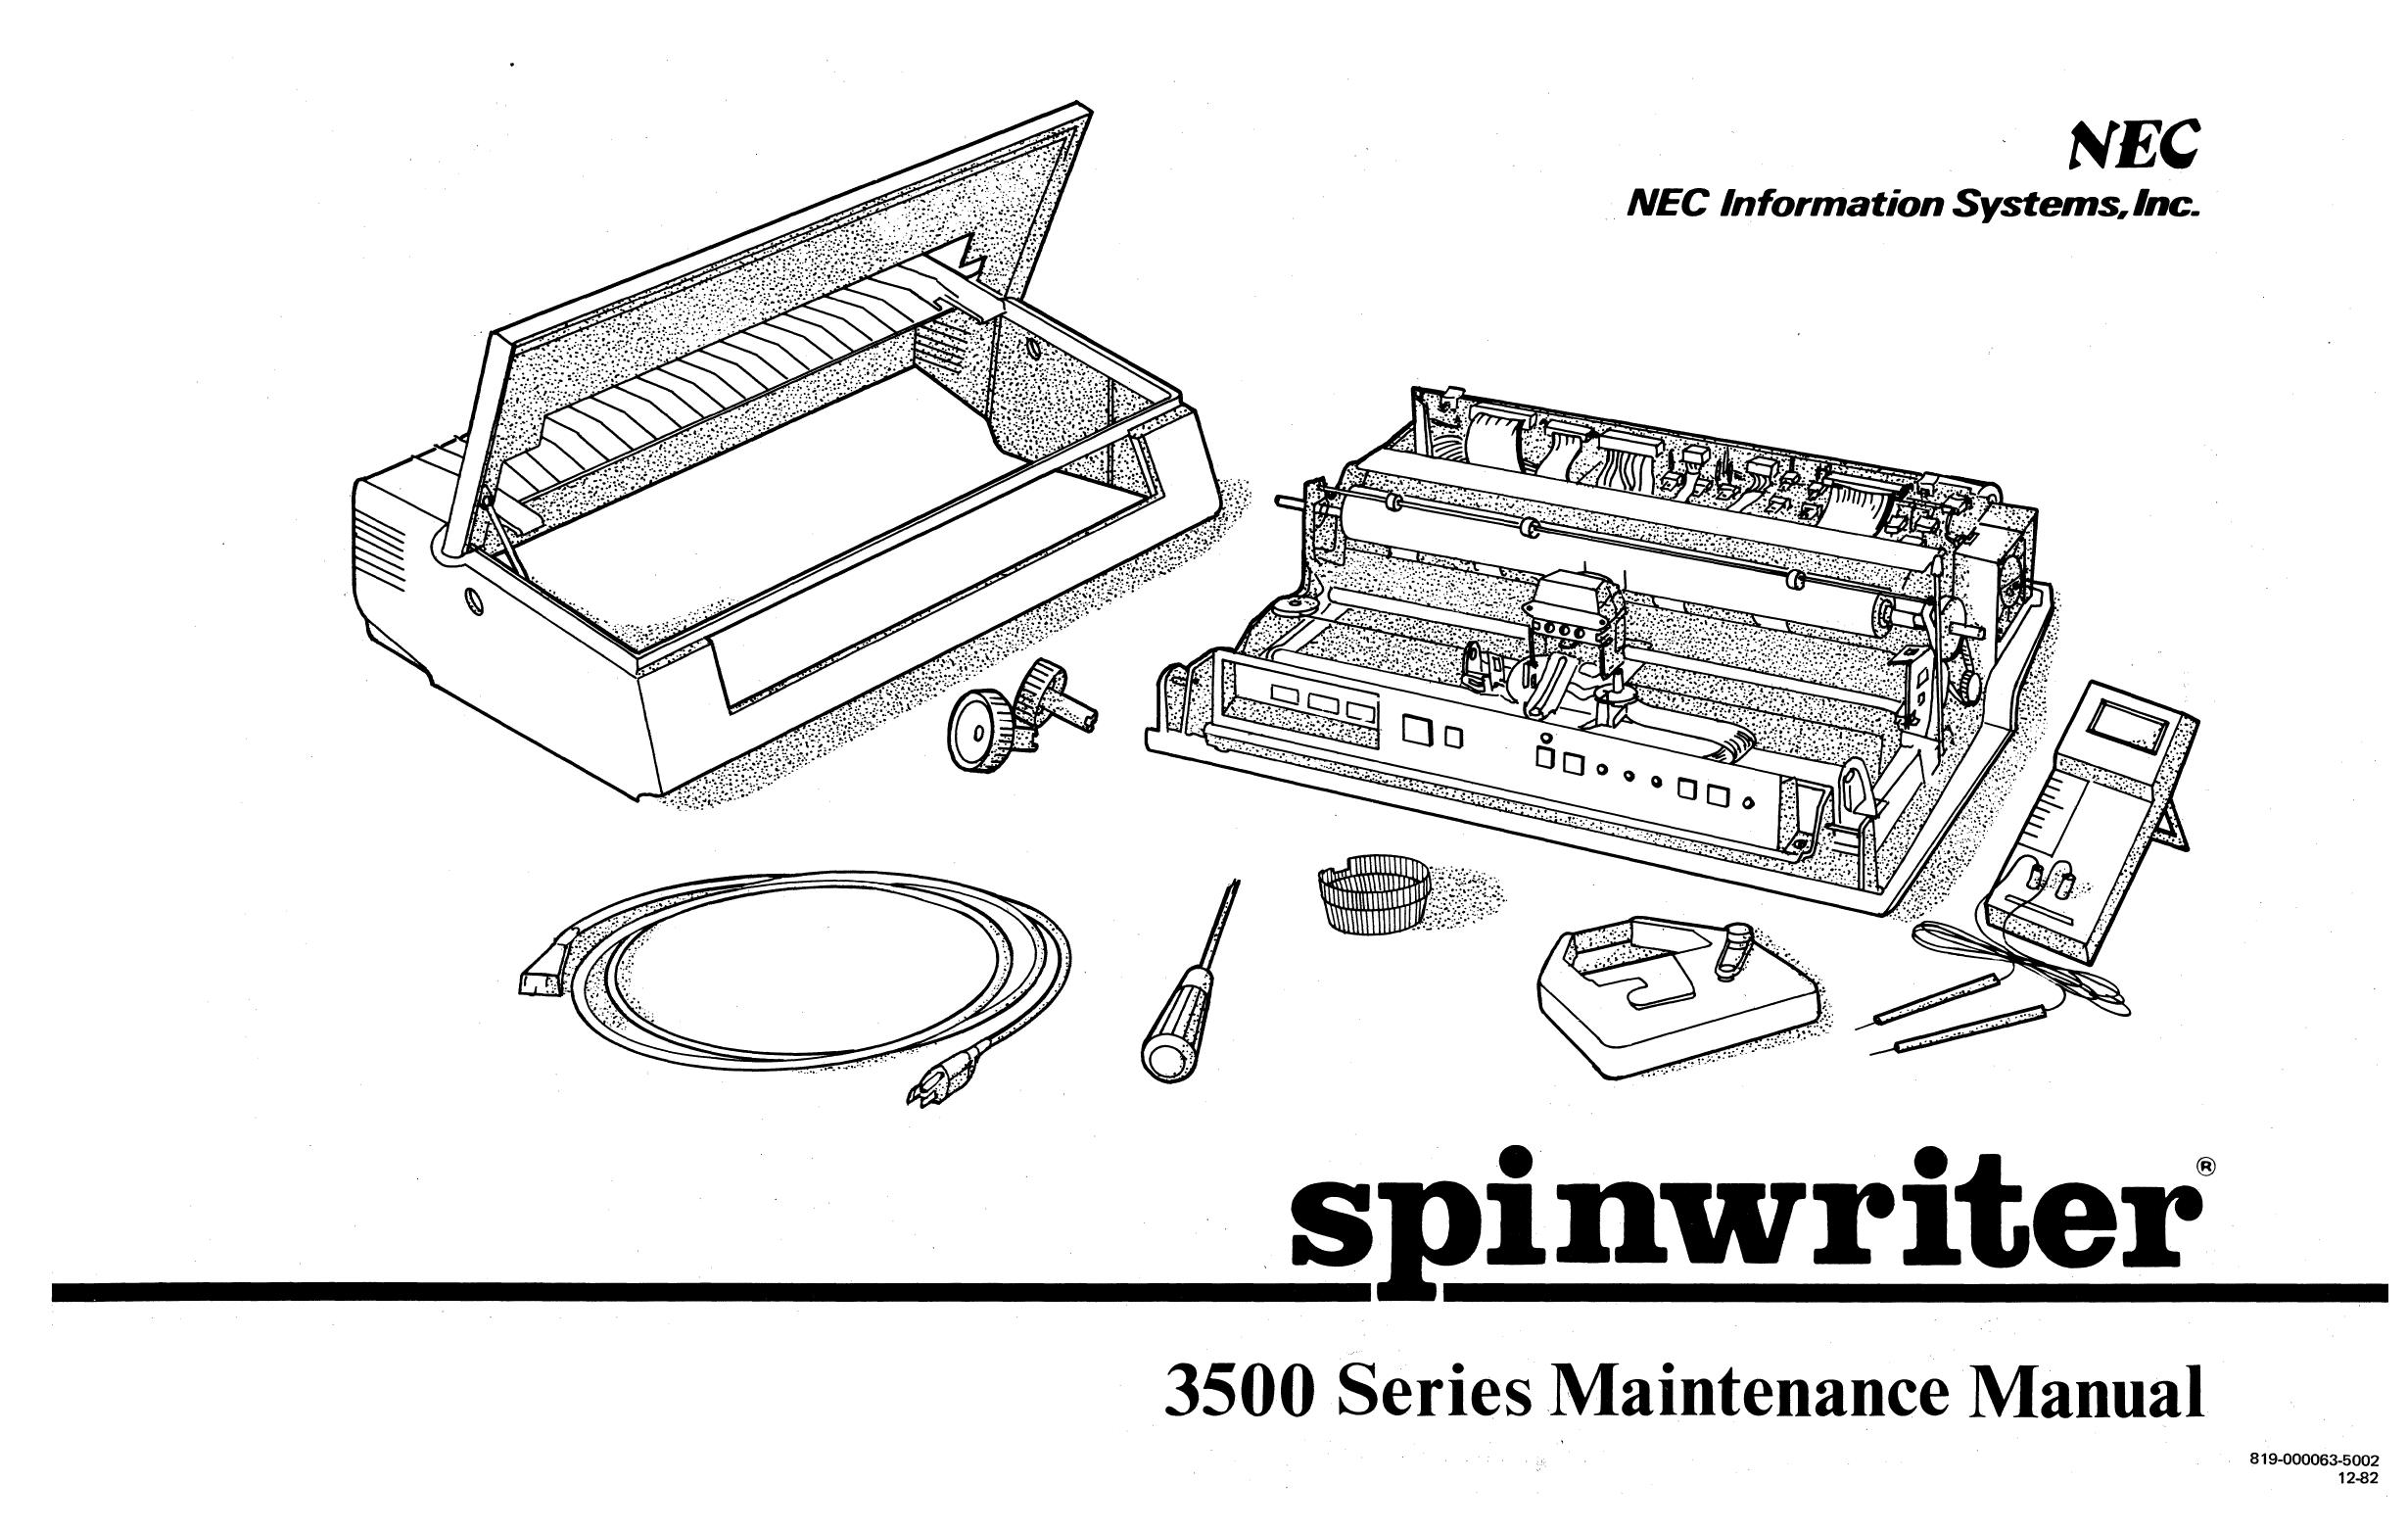 3500 Series Maintenance Manual   manualzz.com